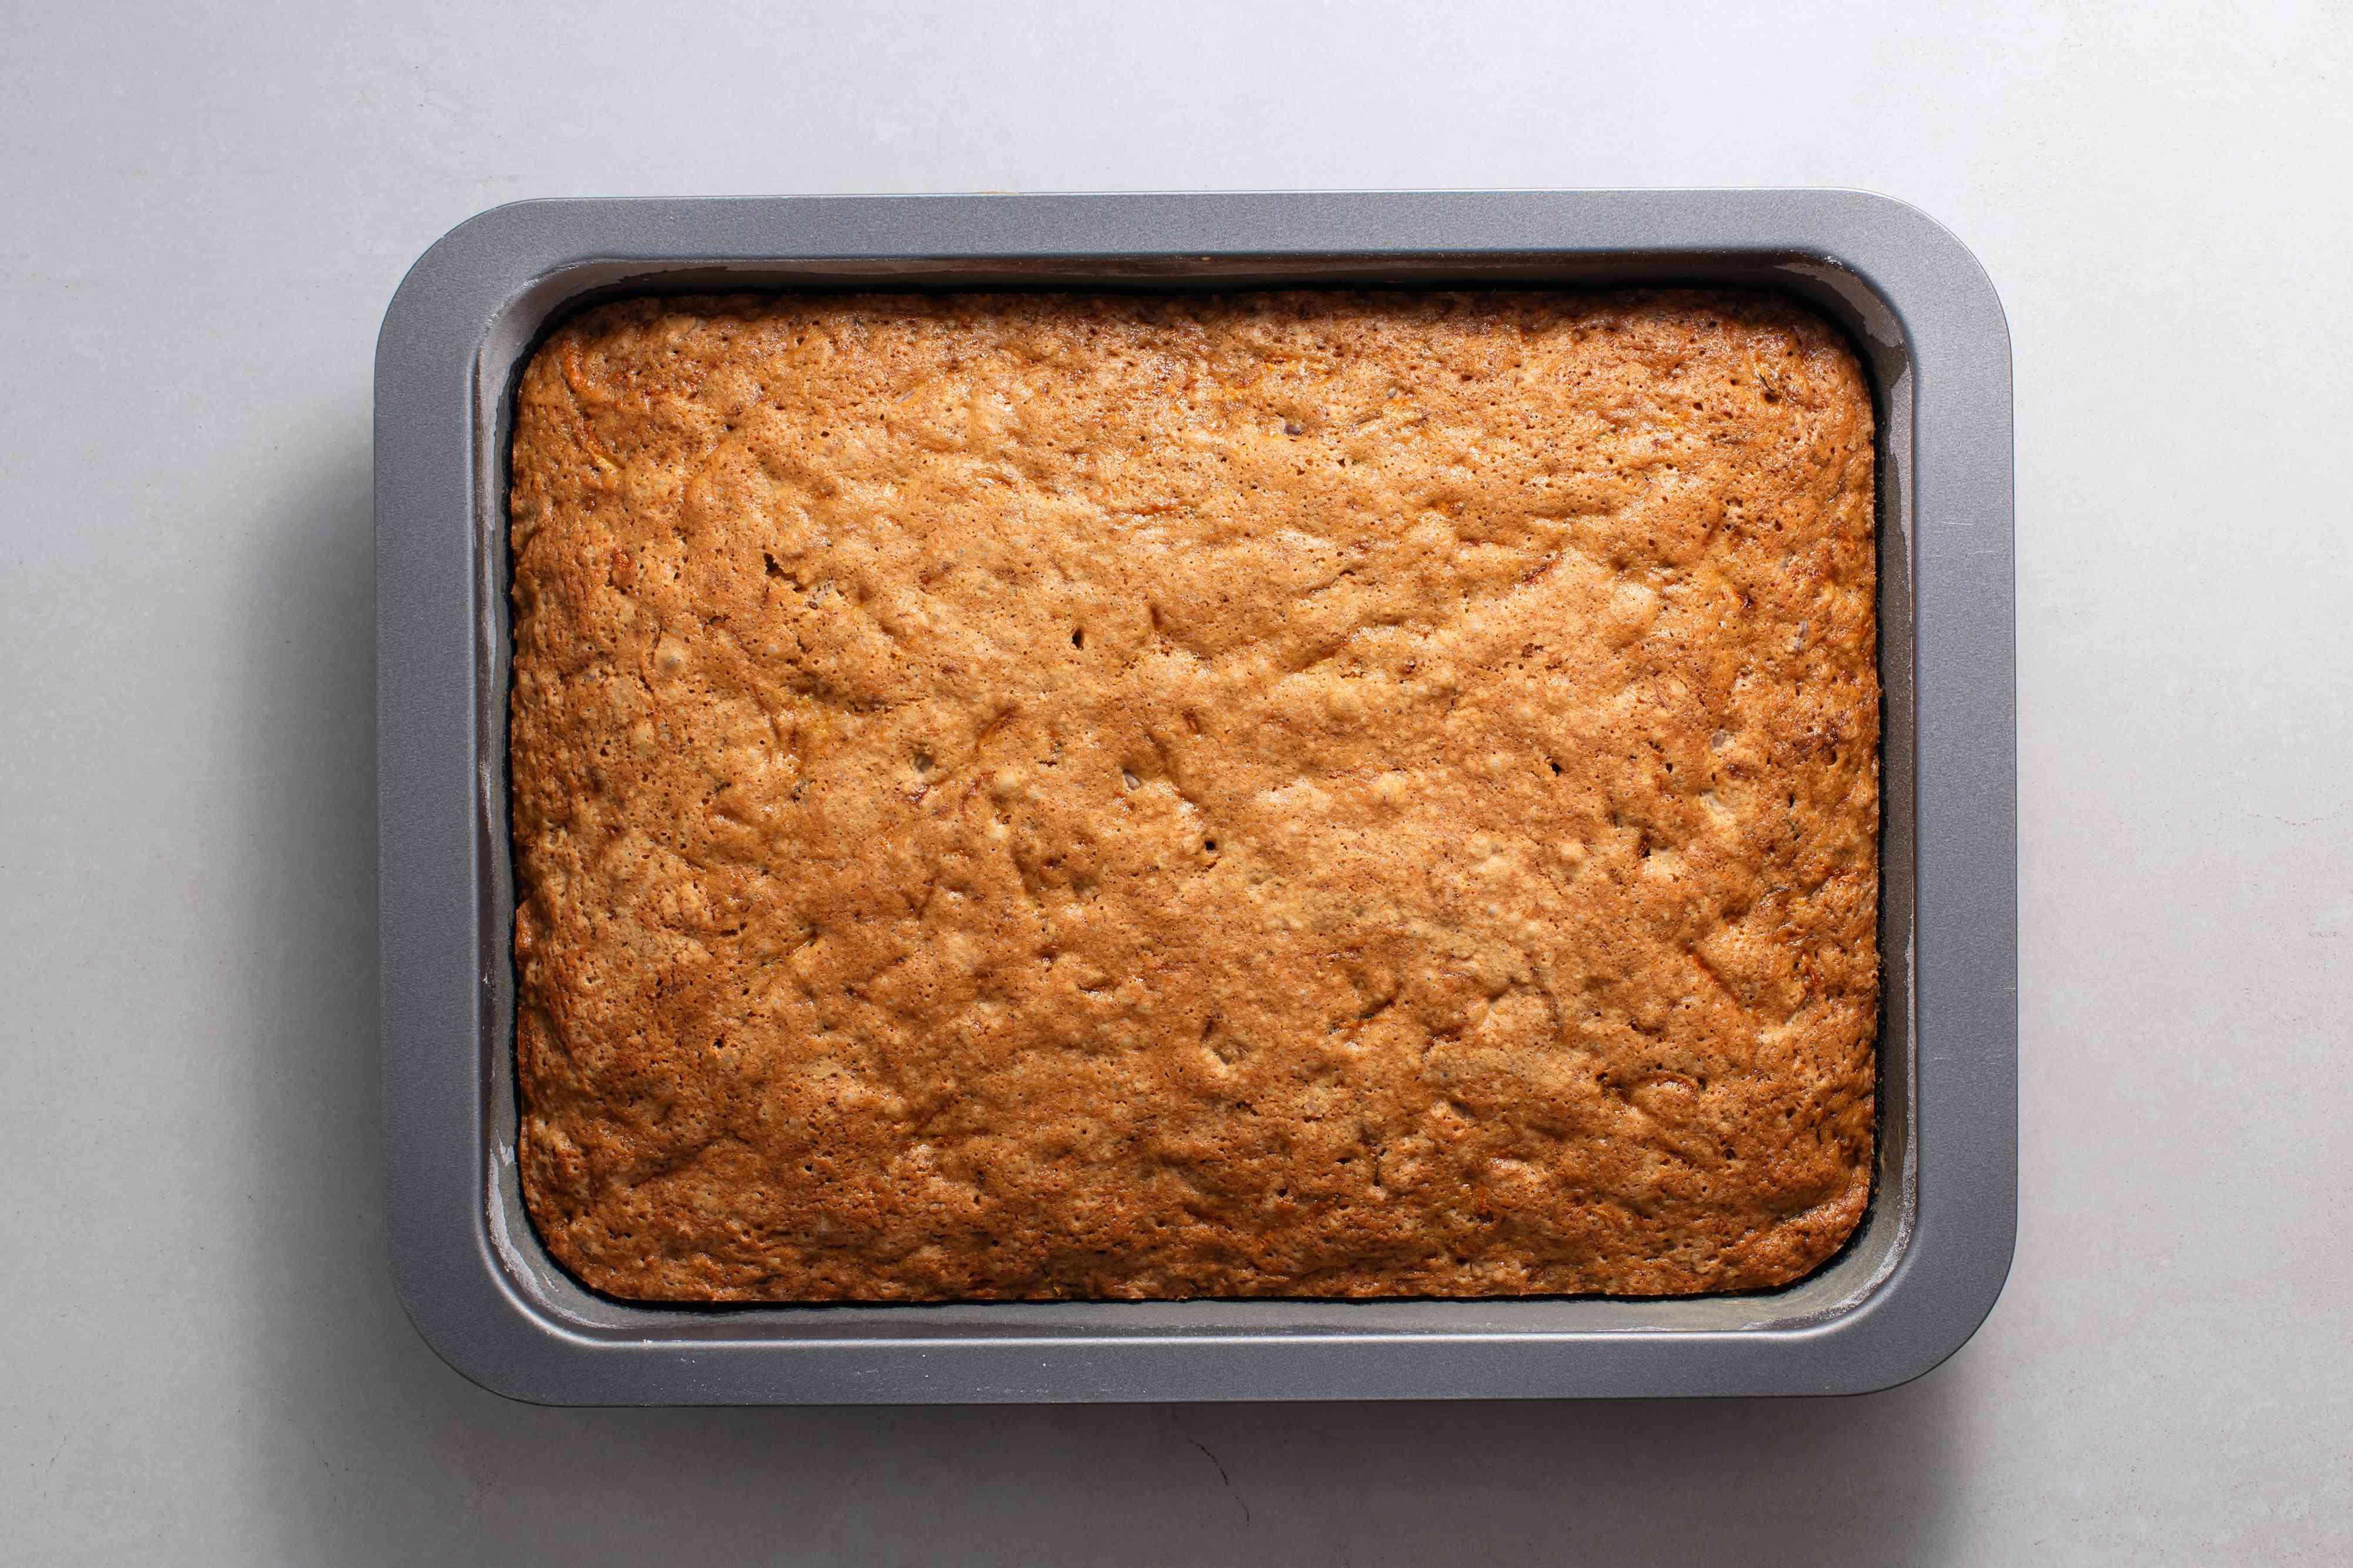 baked cake in a baking pan